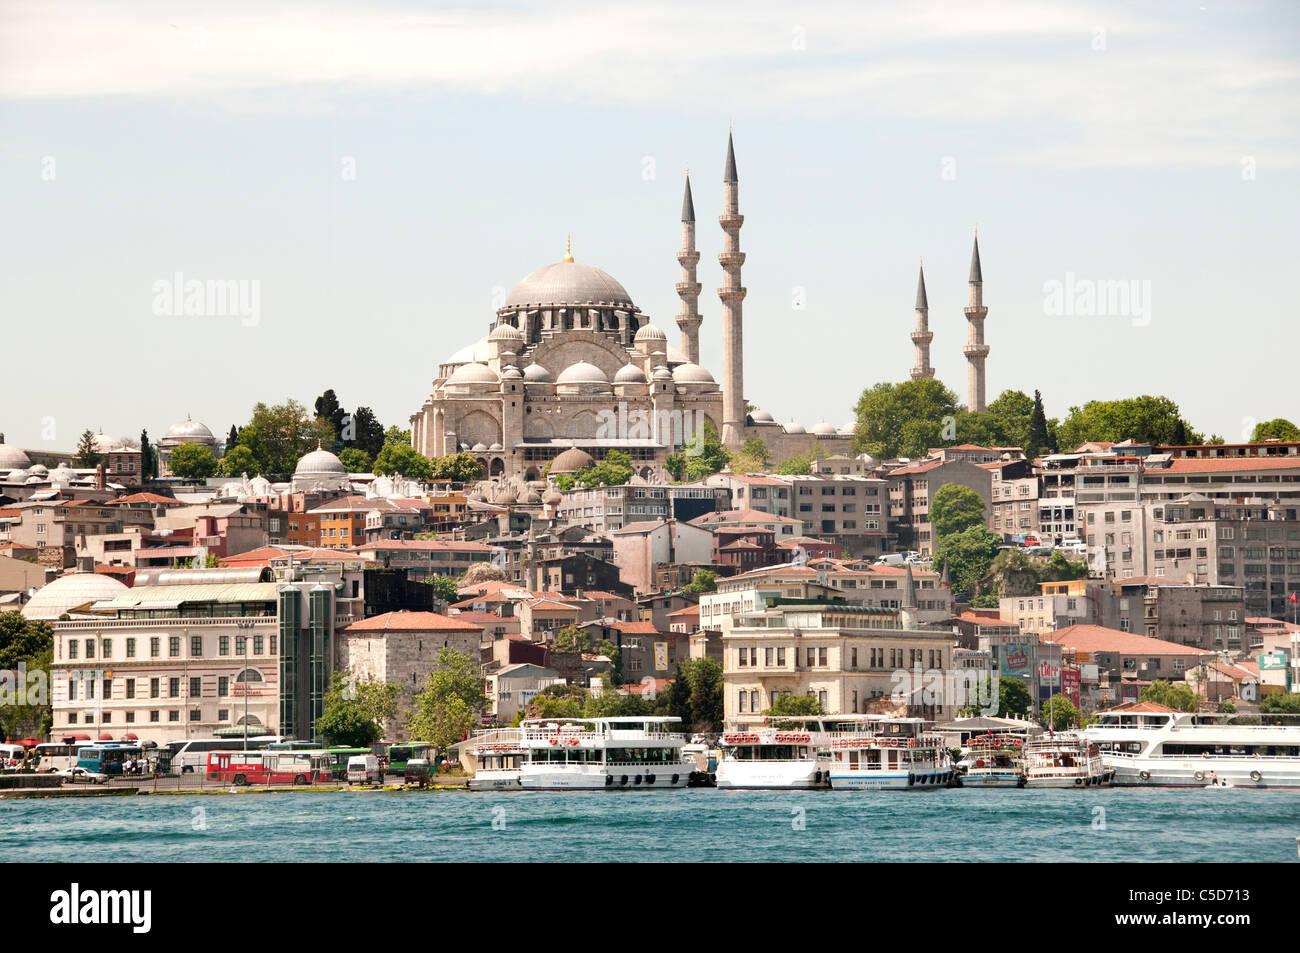 Mosque Suleymaniye Camii Istanbul Turkey Golden Horn - Stock Image